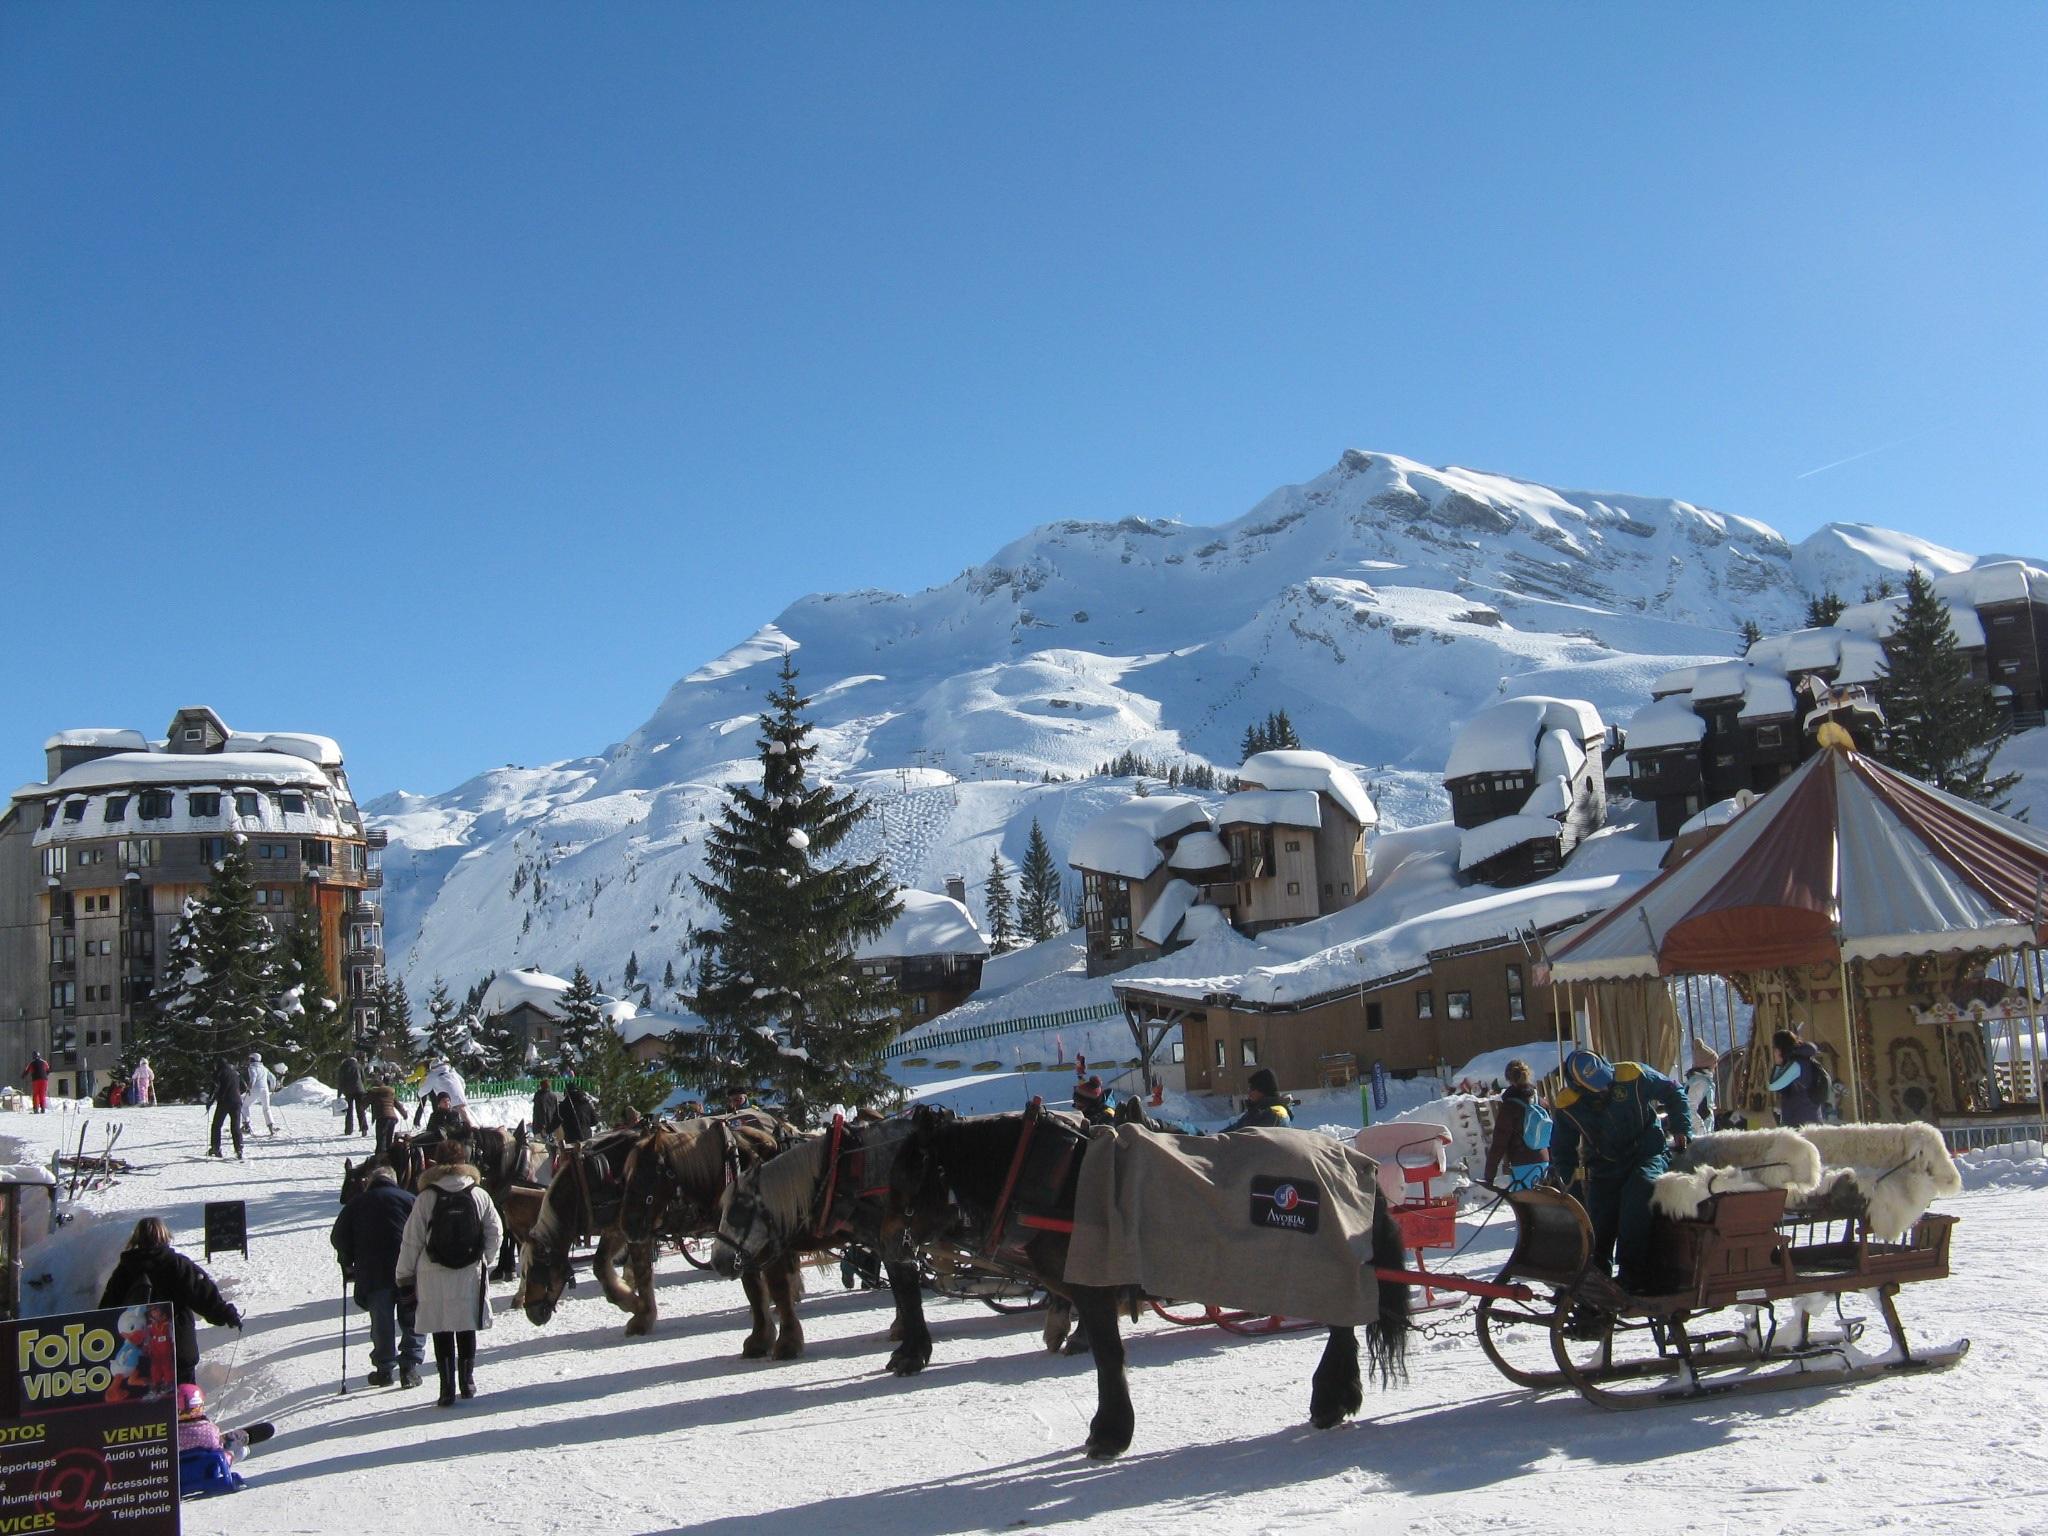 free images : snow, peak, mountain range, vacation, france, vehicle